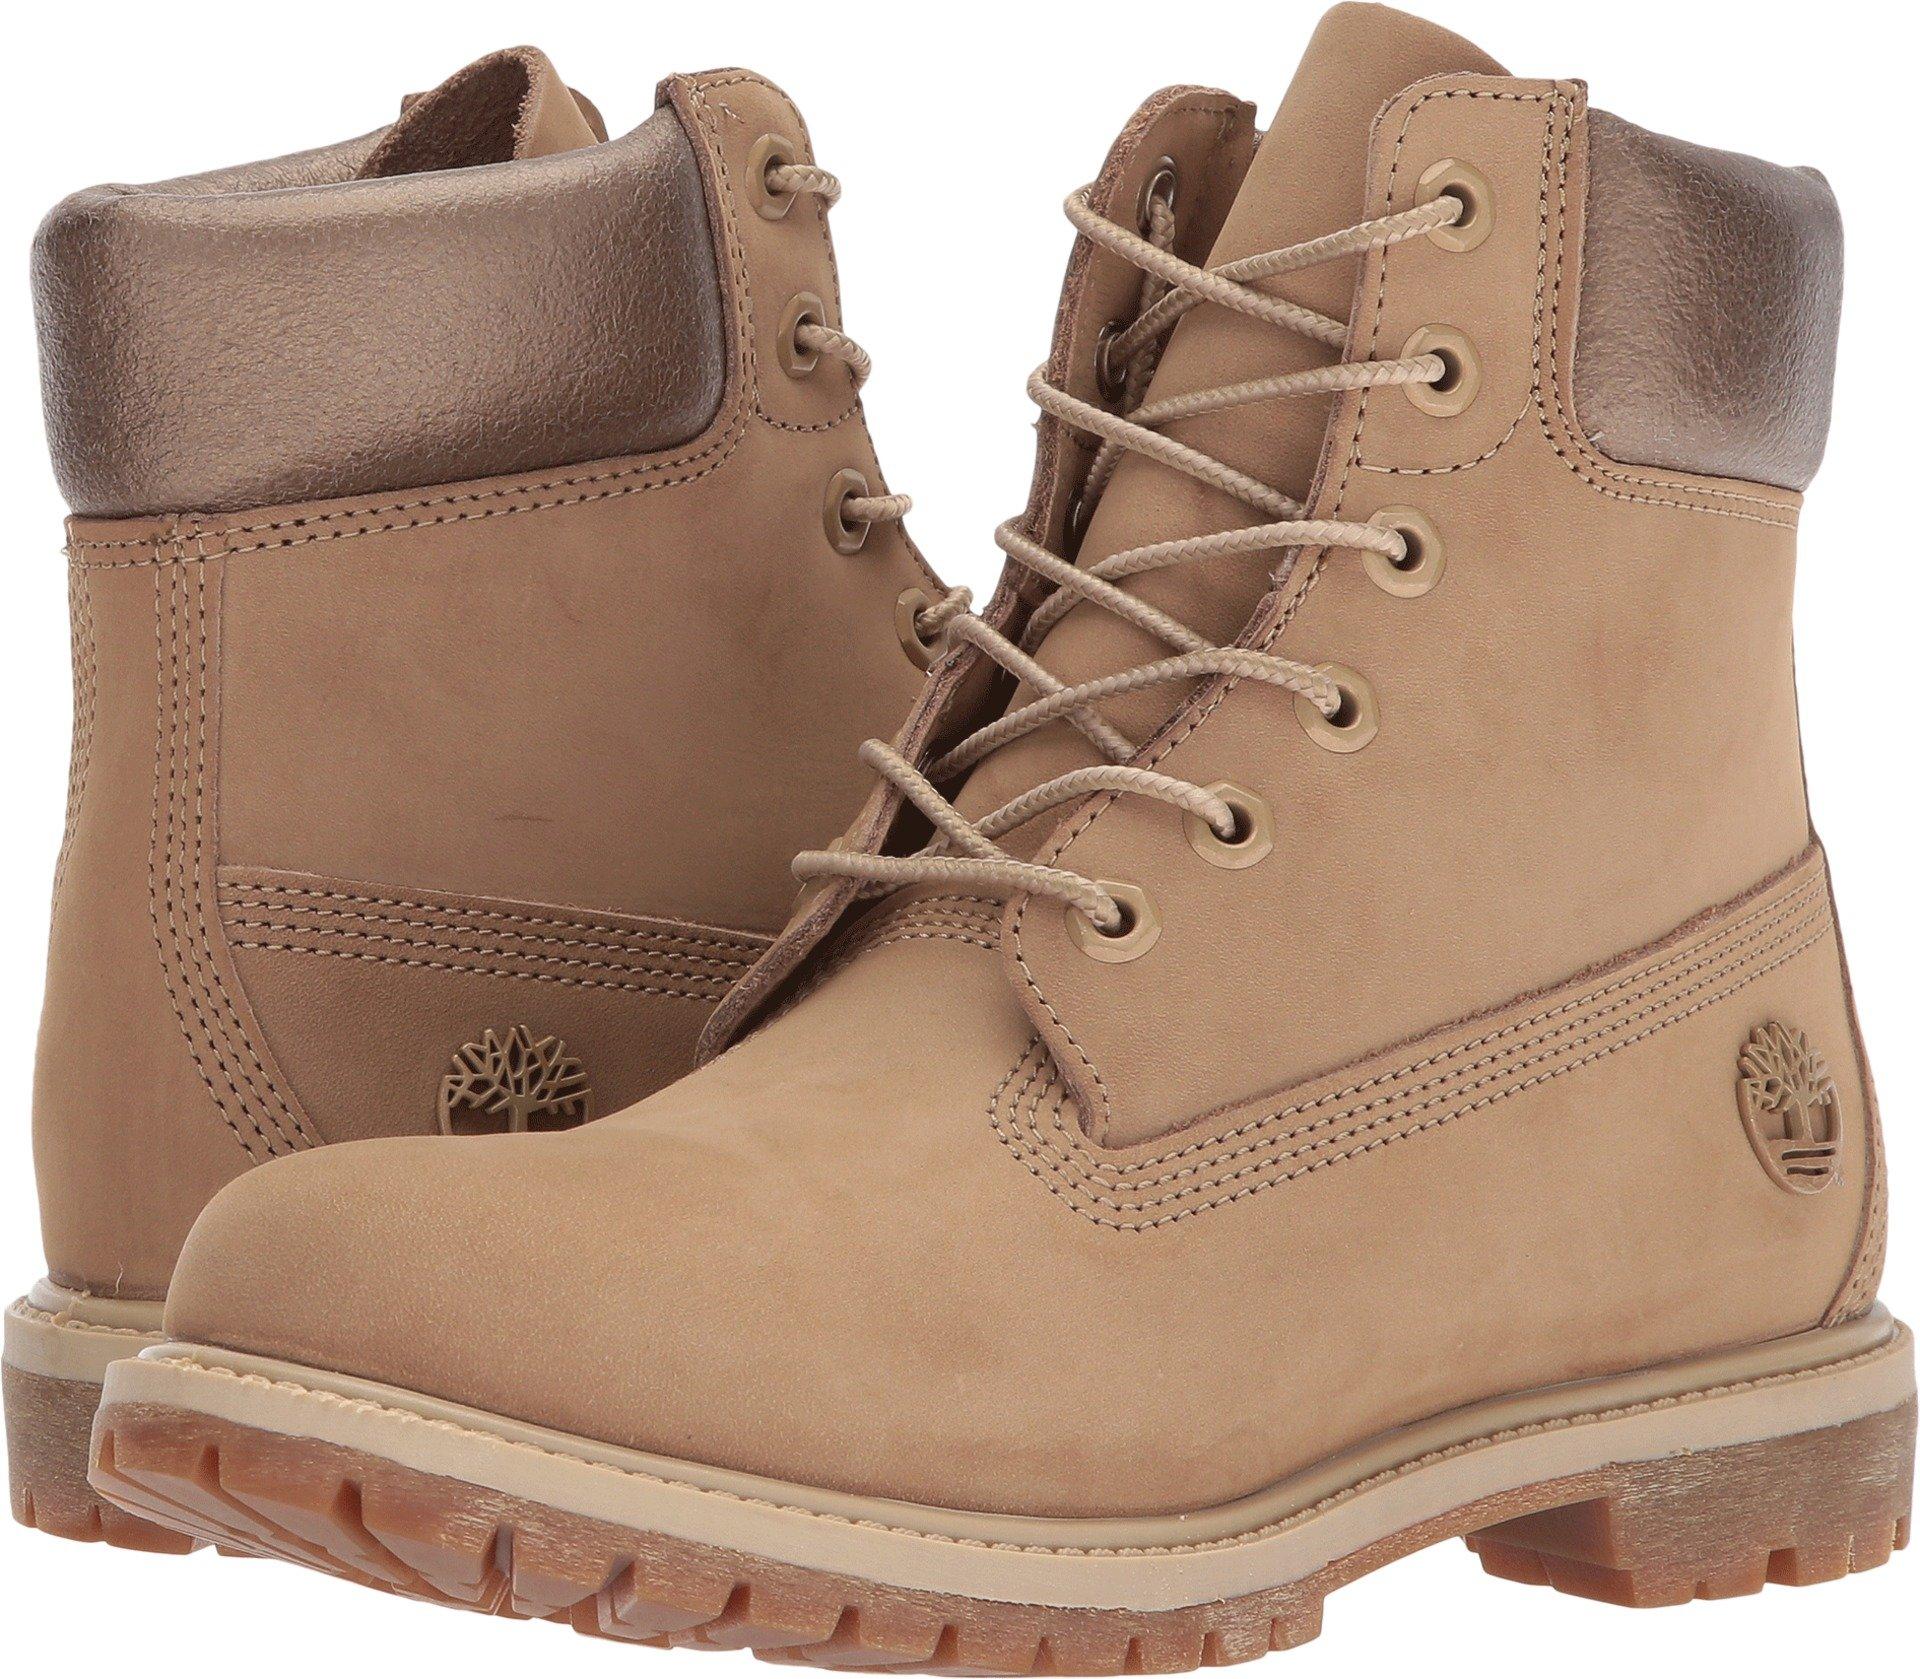 Timberland Women's 6'' Premium Boot Natural Nubuck/Metallic Collar 8.5 B US